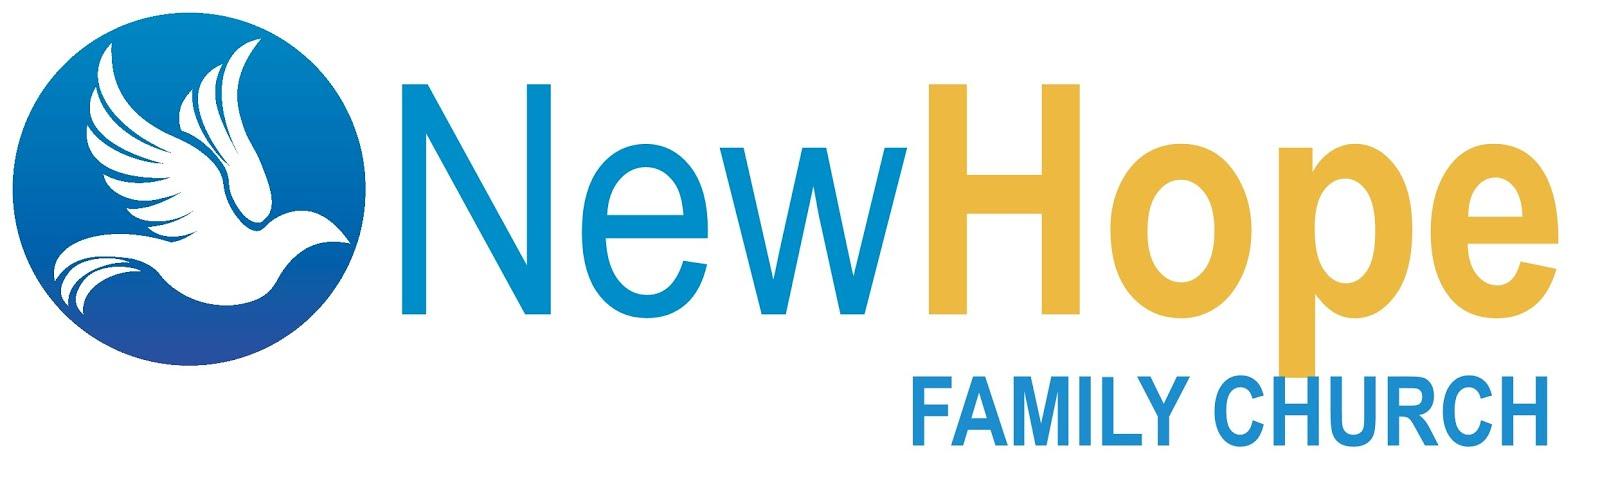 New Hope Family Church